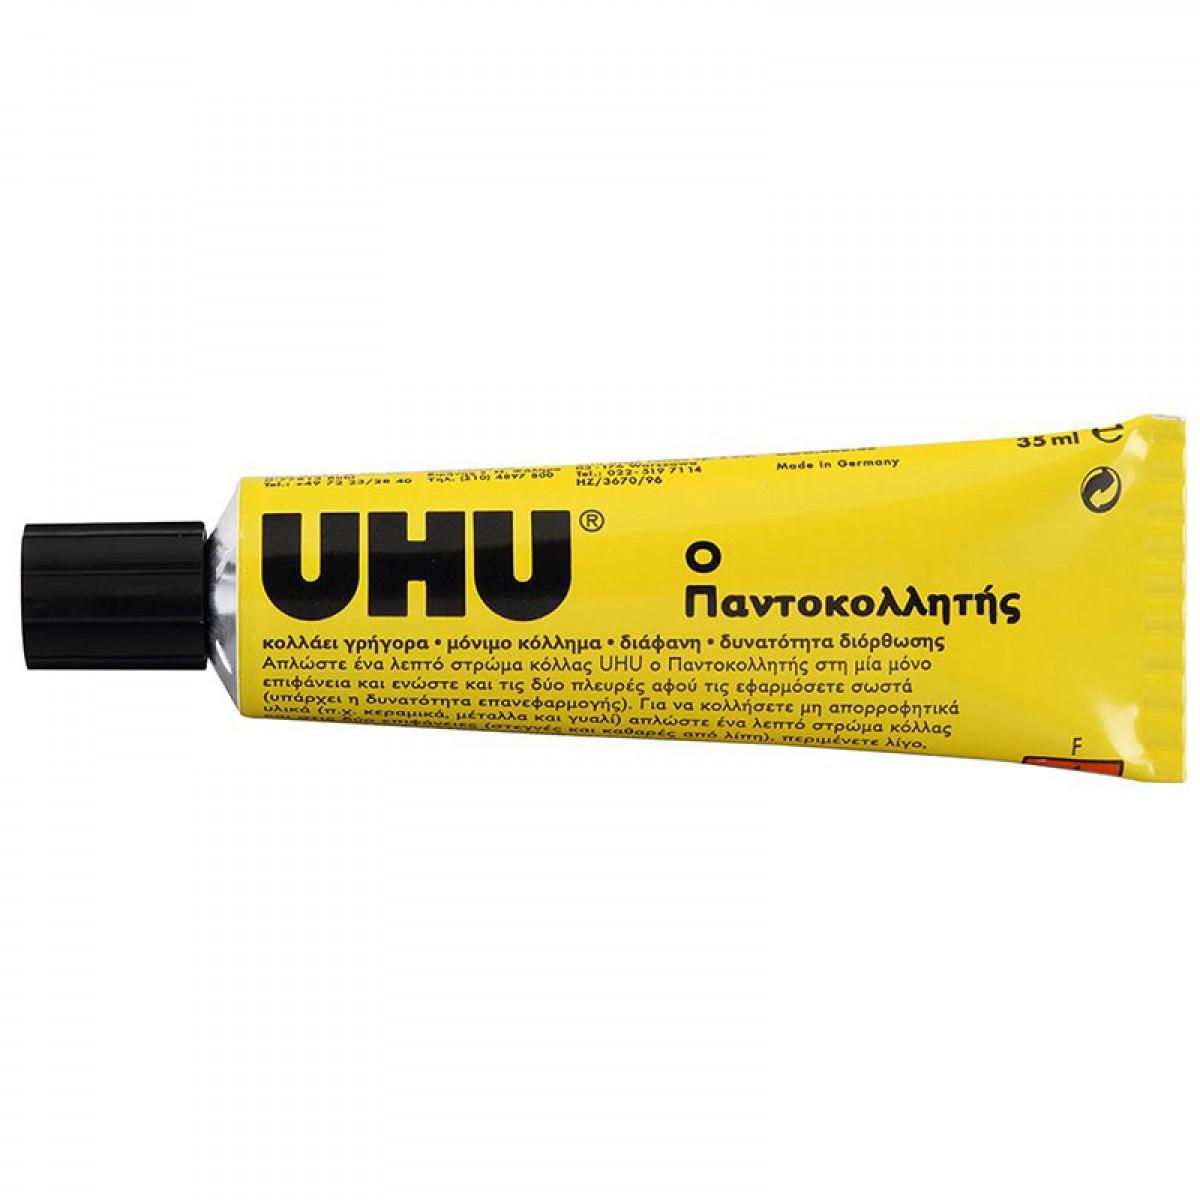 UHU Κόλλα Παντοκολλητής 35ml Υλικά Χειροτεχνίας